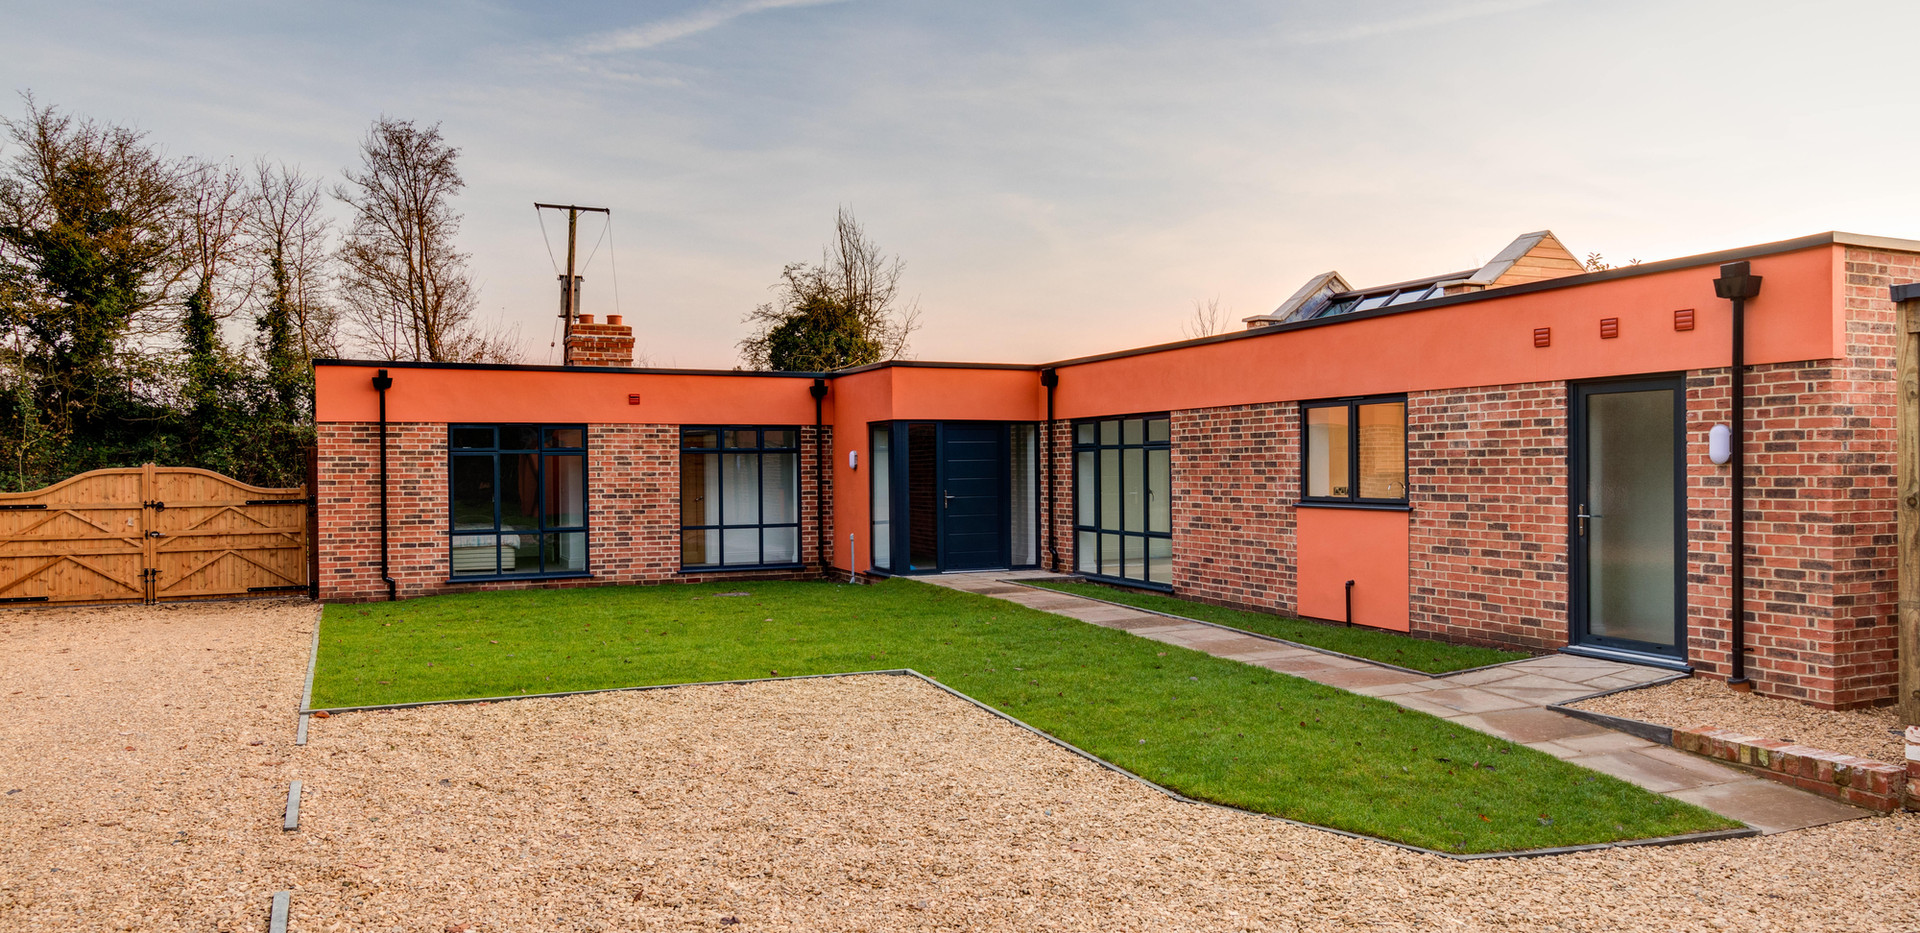 Peach House - The orangery -11.jpg